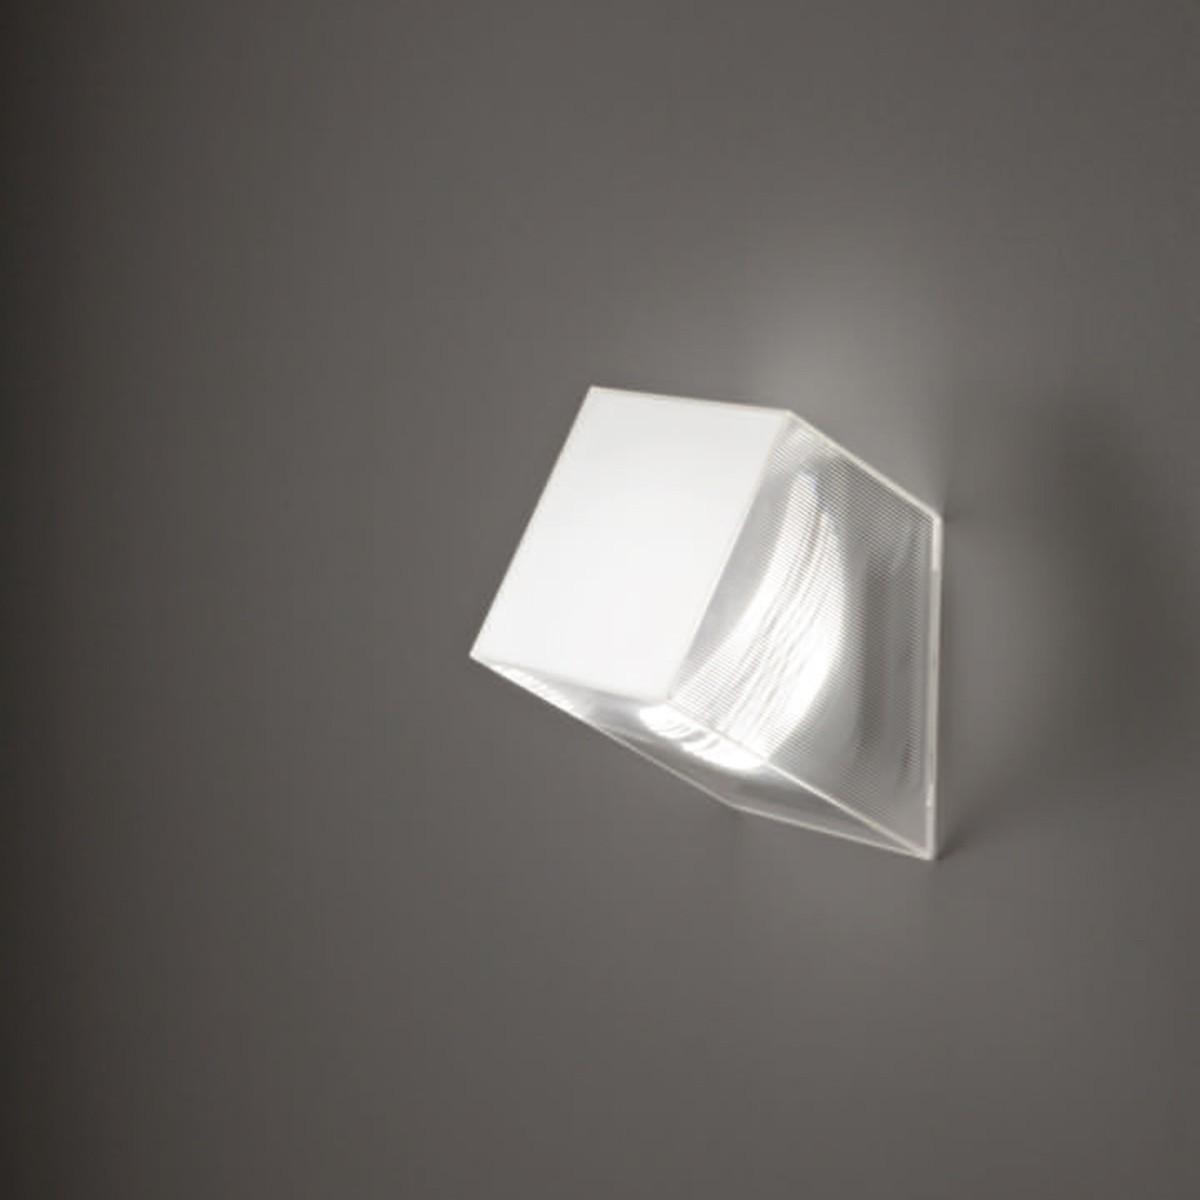 Studio Italia Design Beetle 60° Cube Wand- / Deckenleuchte, Mini, weiß / transparent